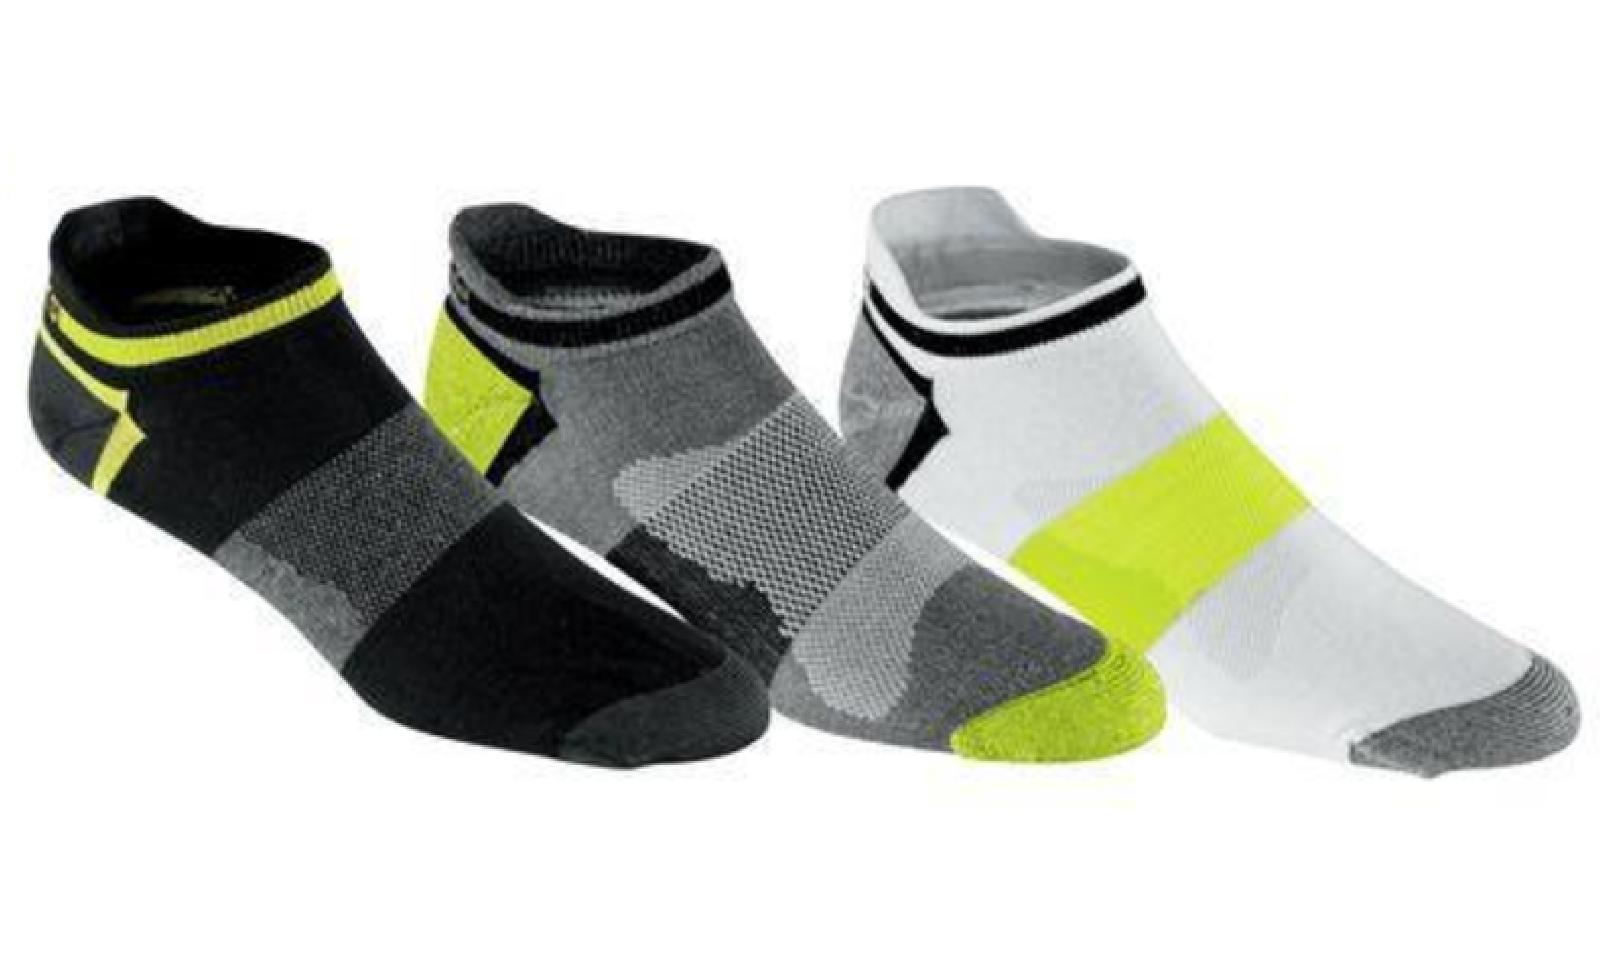 Asics Quick Lyte Low Cut Green 3 Pairs Socks L Large Sz 9.5-11.5 Men/ 10+ Women